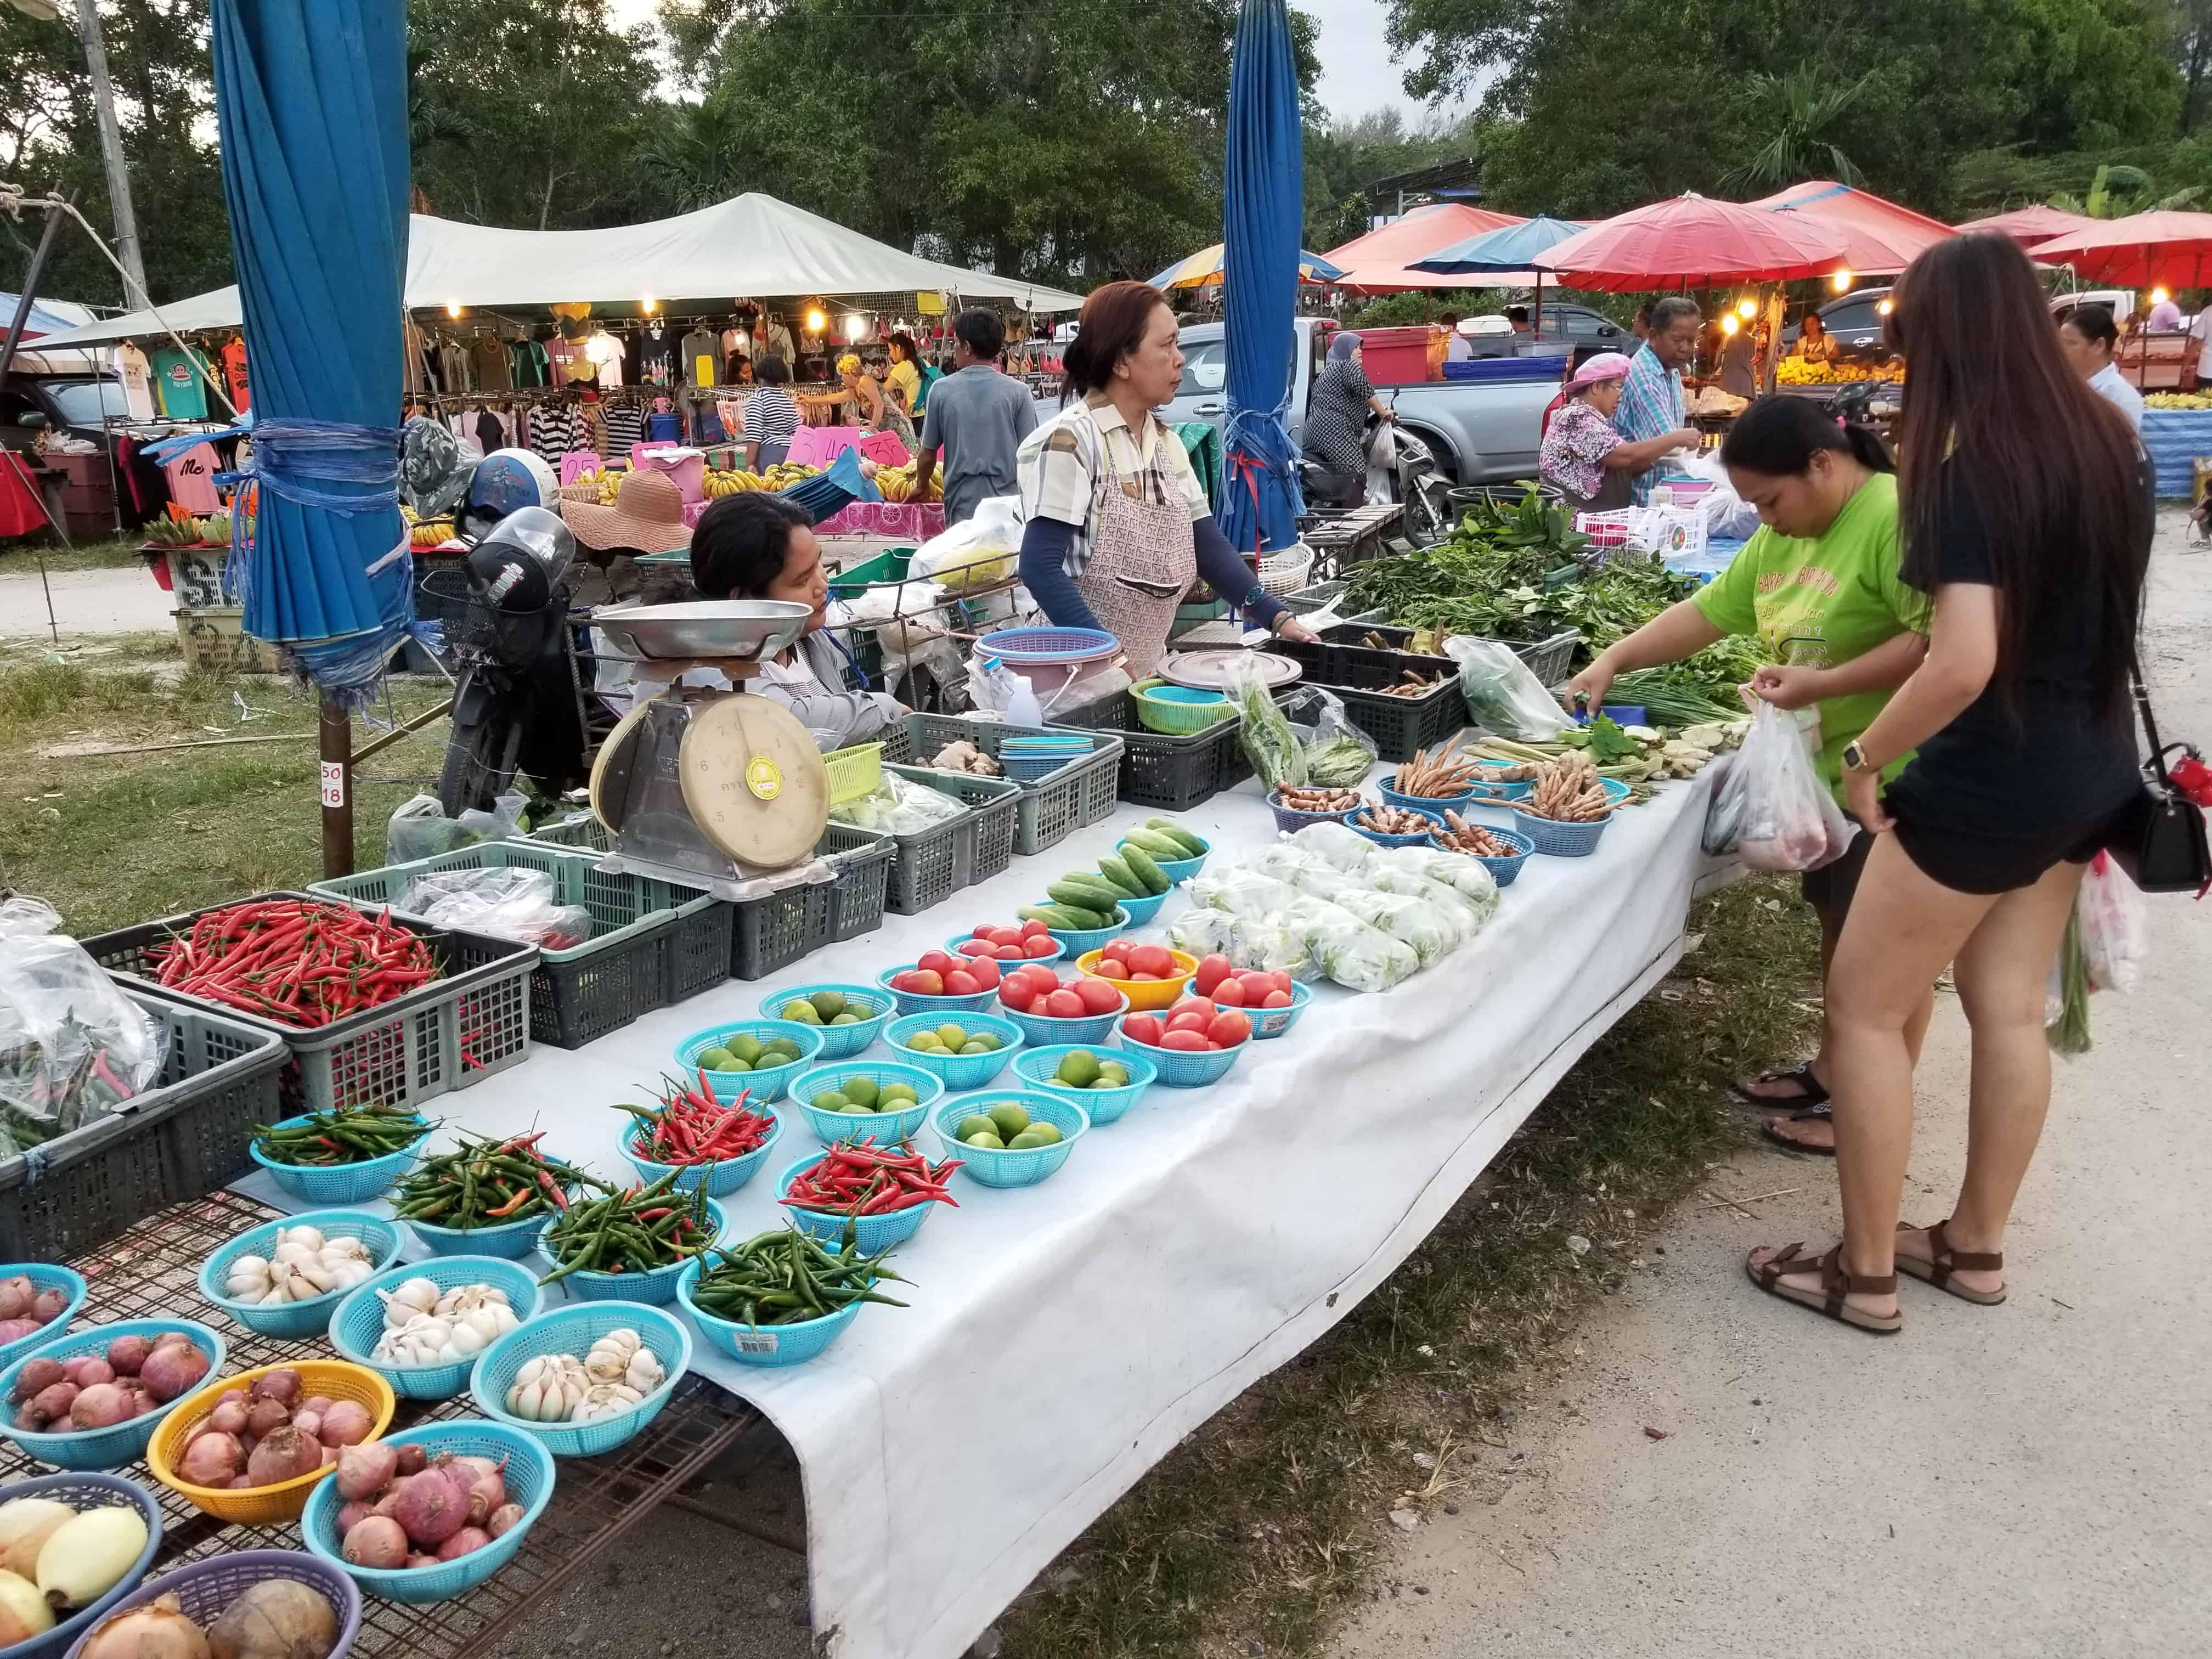 image-of-produce-vendor-atnai-yang-market-in-phuket-thailand